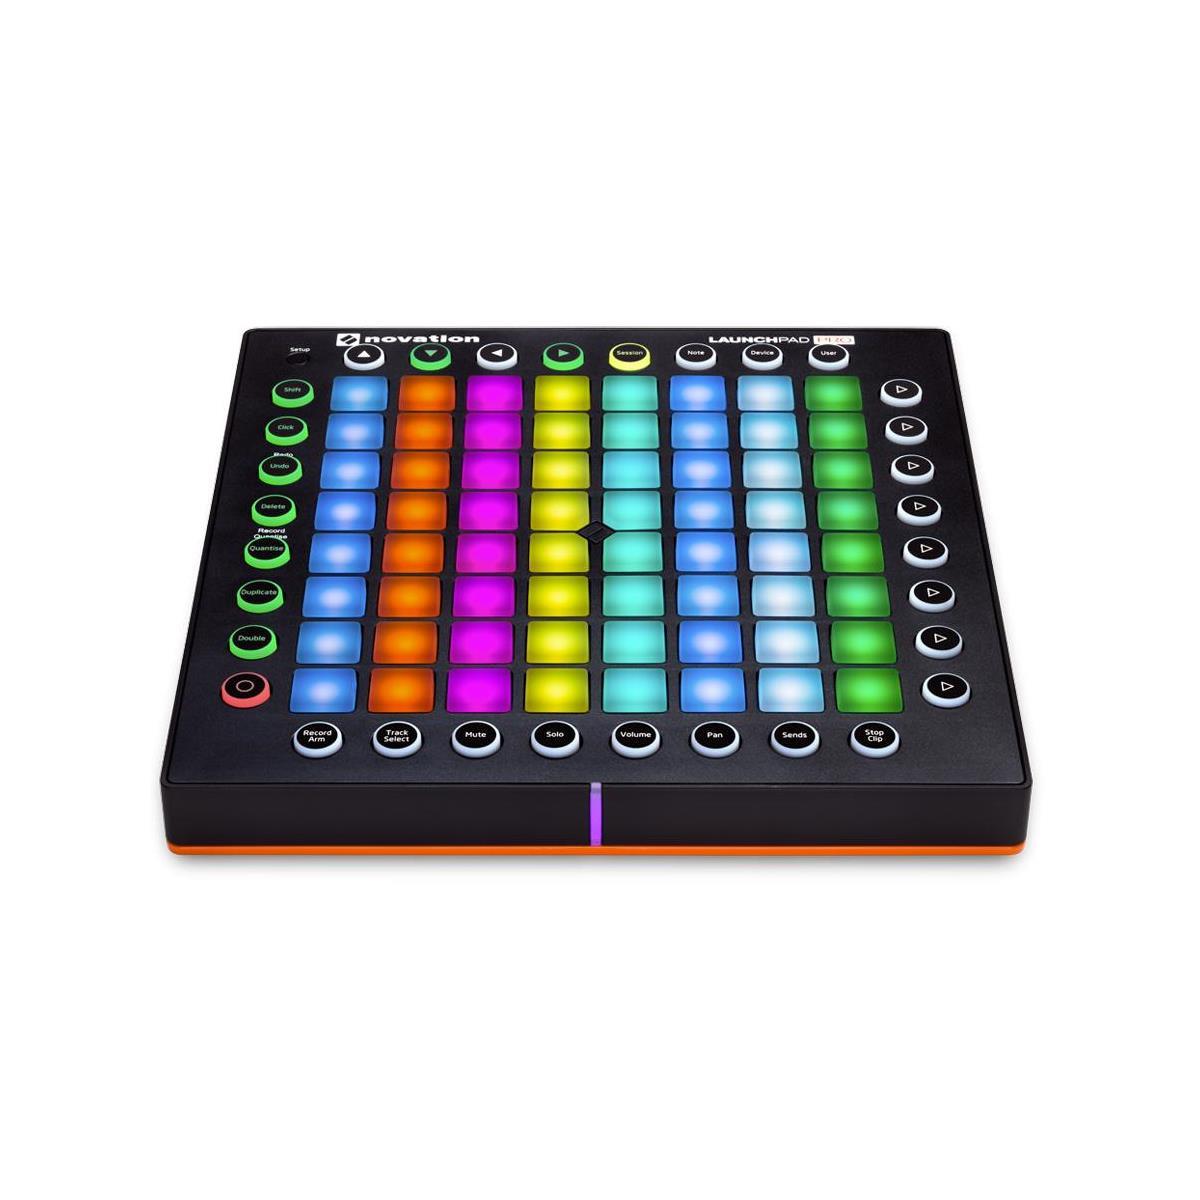 Novation Launchpad USB MIDI Controller $100 or Novation Launchpad Pro USB Midi Controller $210 + free s/h